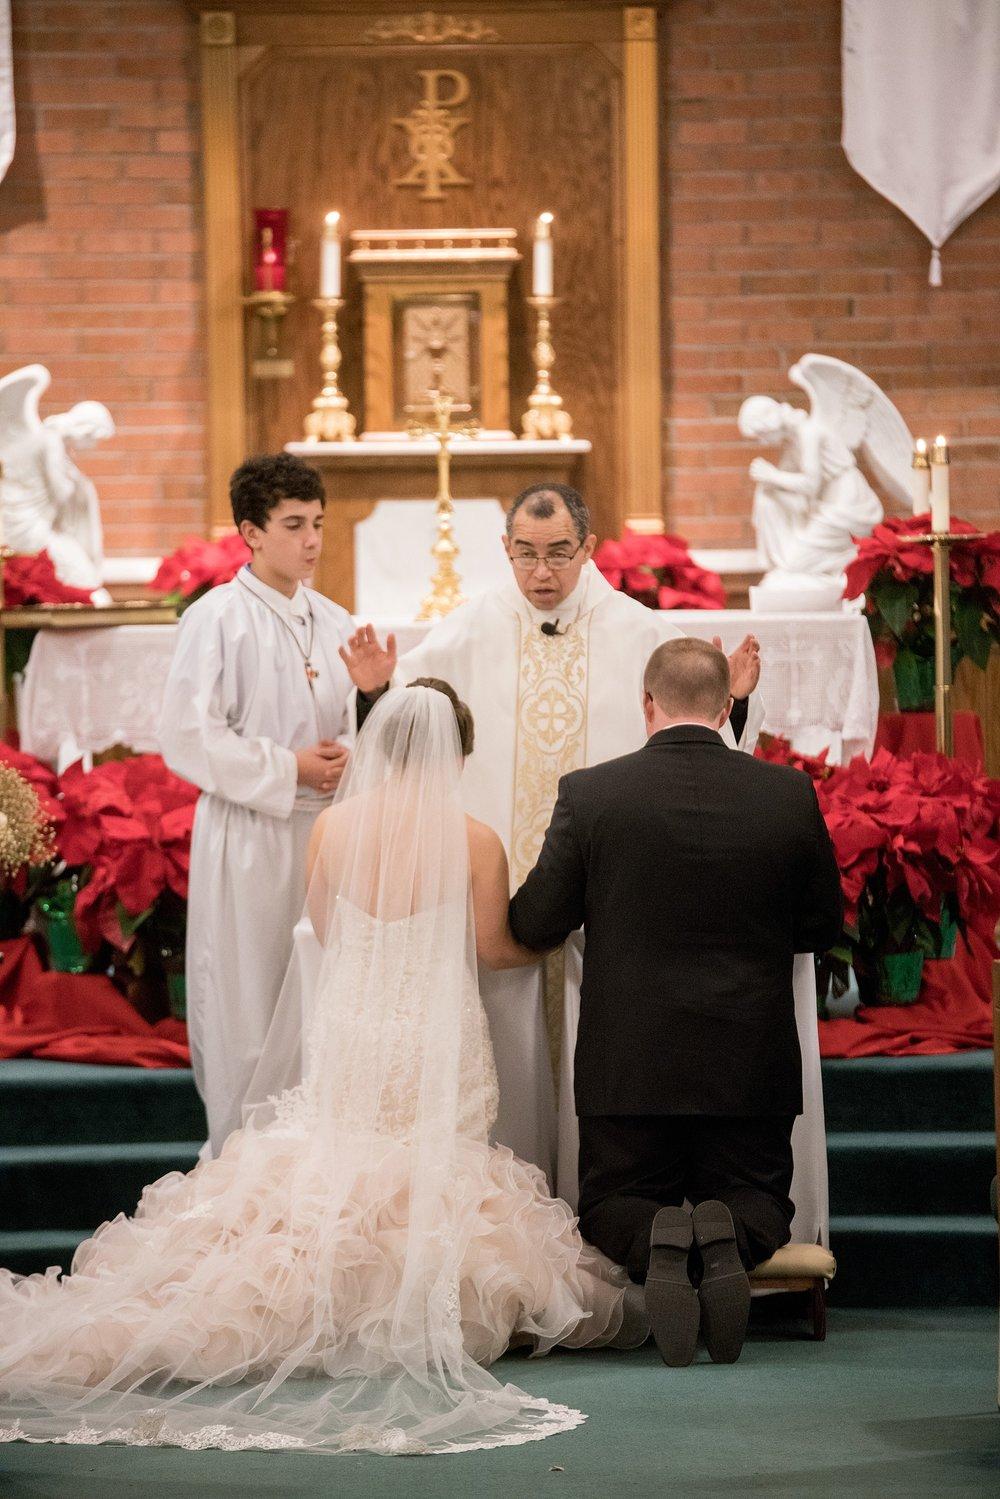 Goldsboro-NC-Photography-Wedding-168.jpg